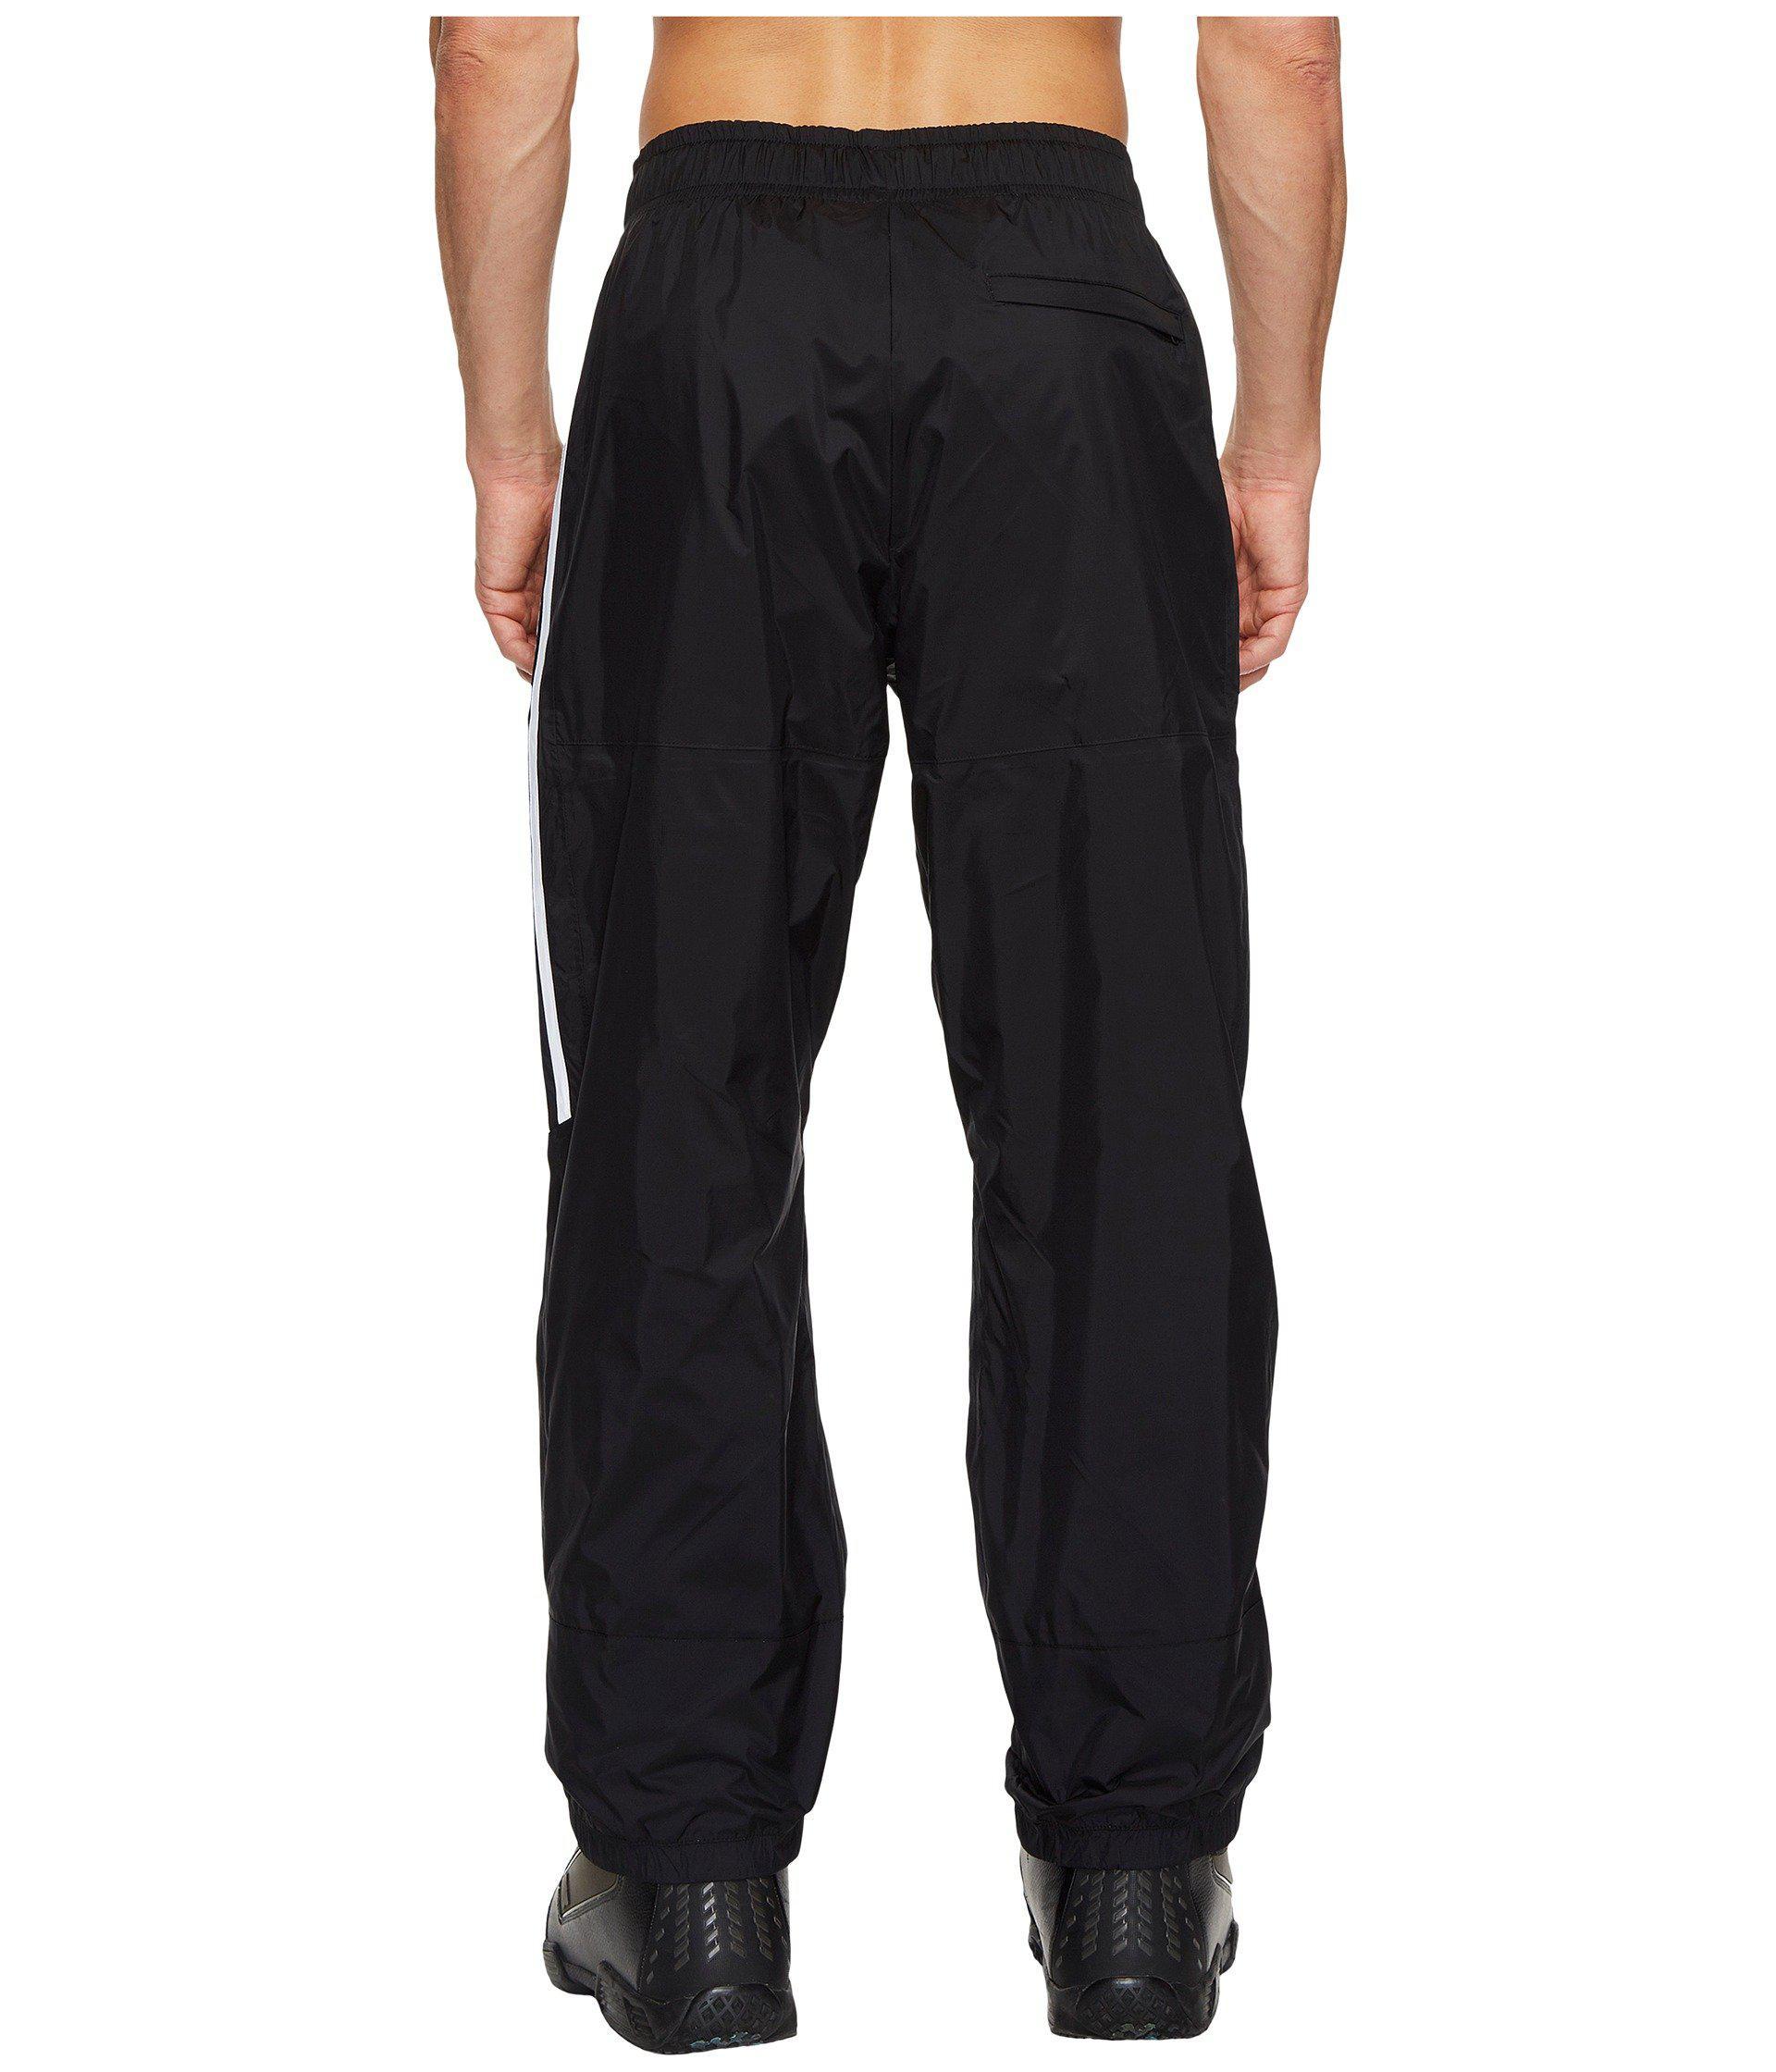 8f4cd1e9 adidas Originals Slopetrotter Pants in Black for Men - Lyst